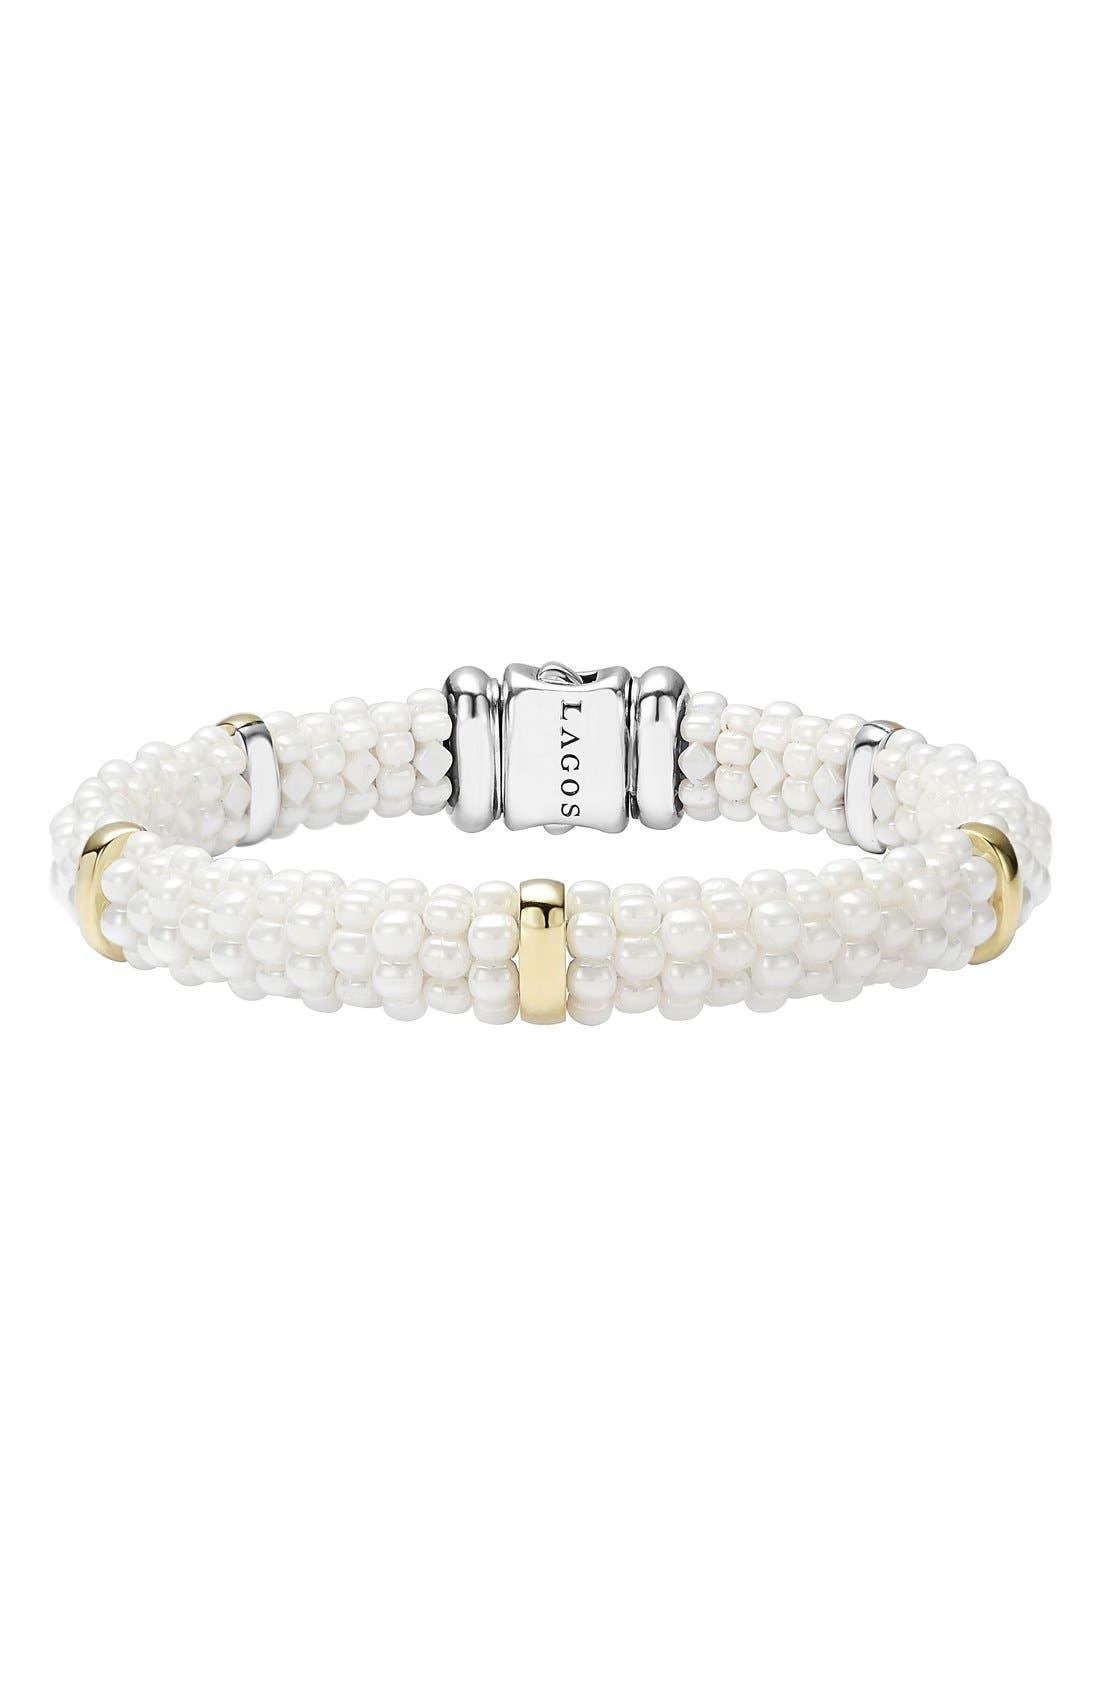 LAGOS 'White Caviar' Station Bracelet